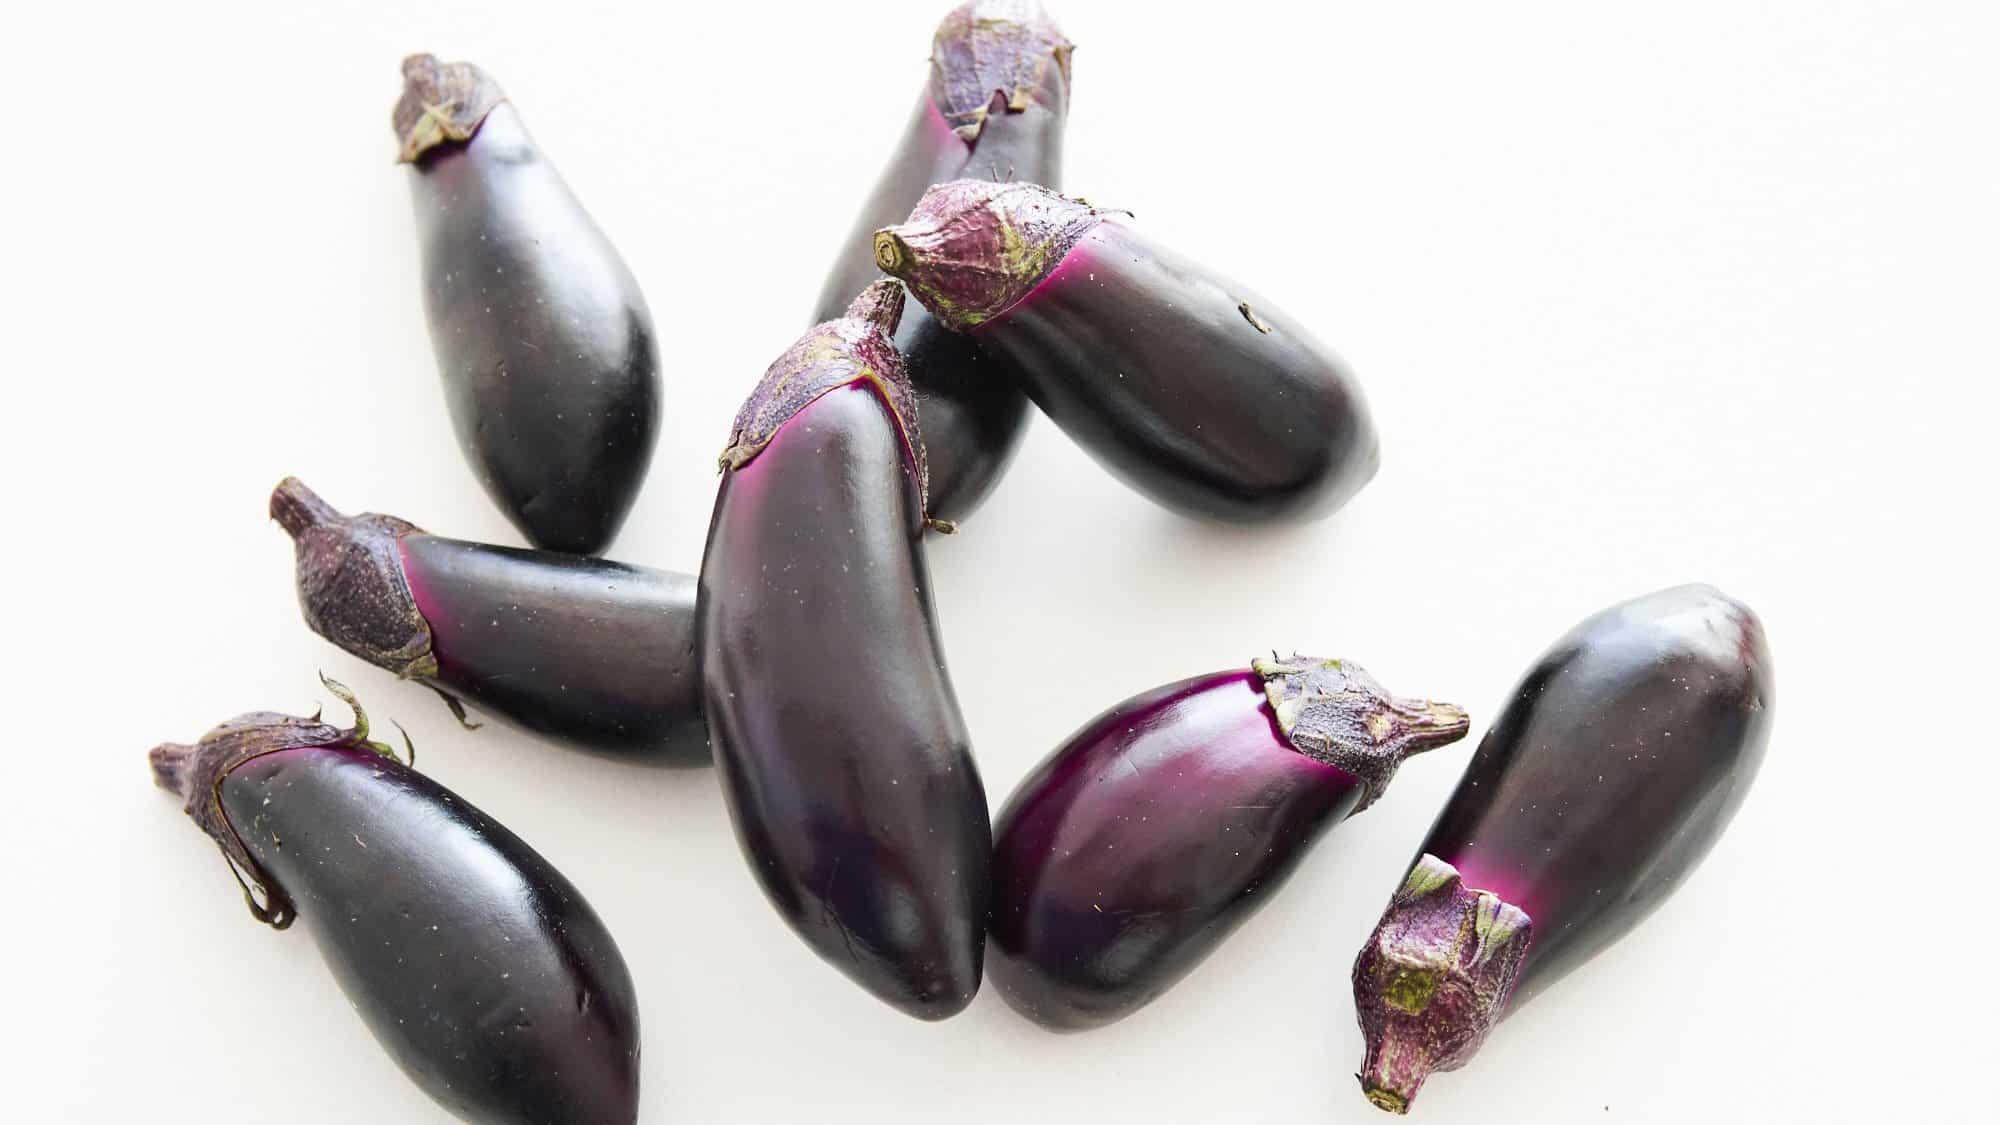 Whole eggplant for Mutabbal